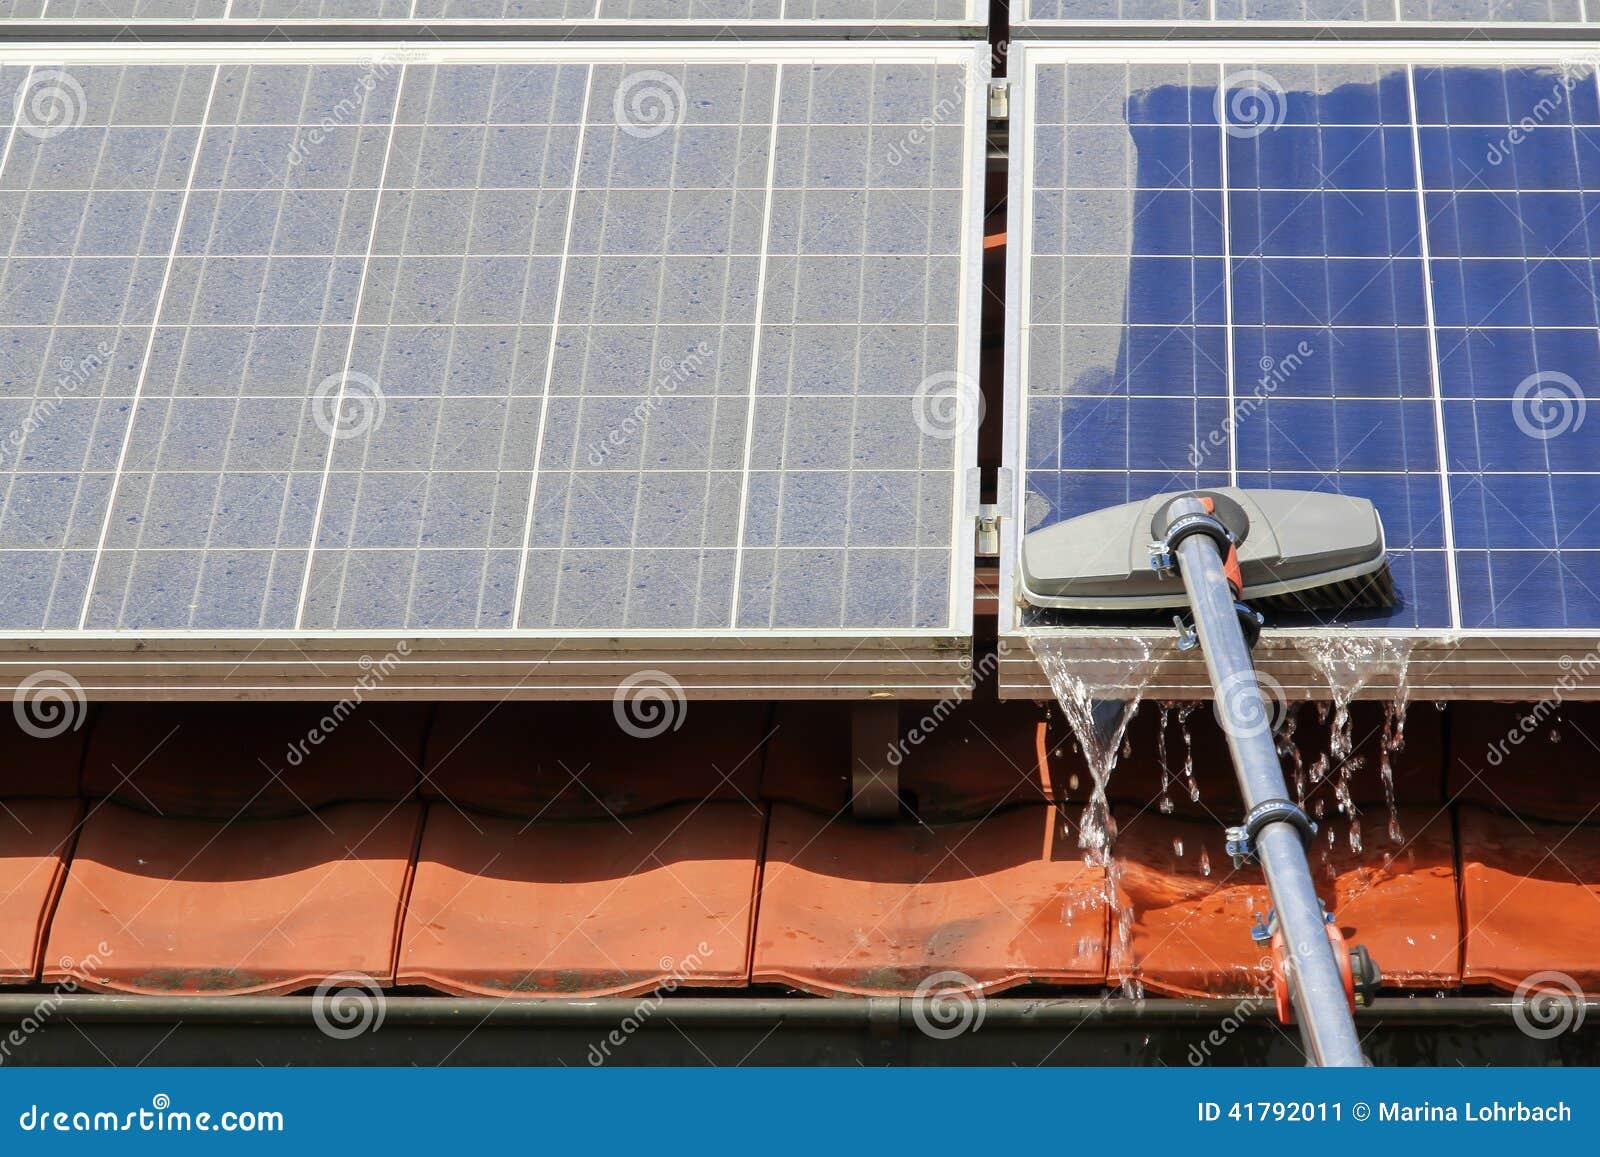 Cleaning Solar Panels Stock Photo Image 41792011